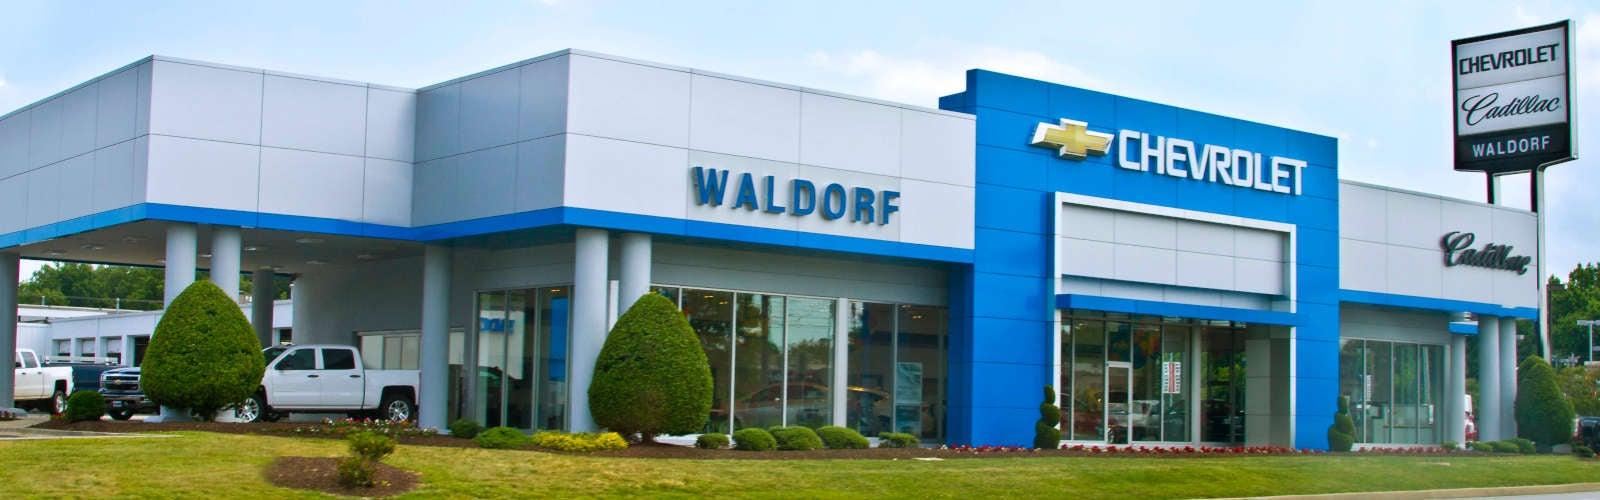 Waldorf Chevrolet Cadillac Chevrolet Dealer In Maryland